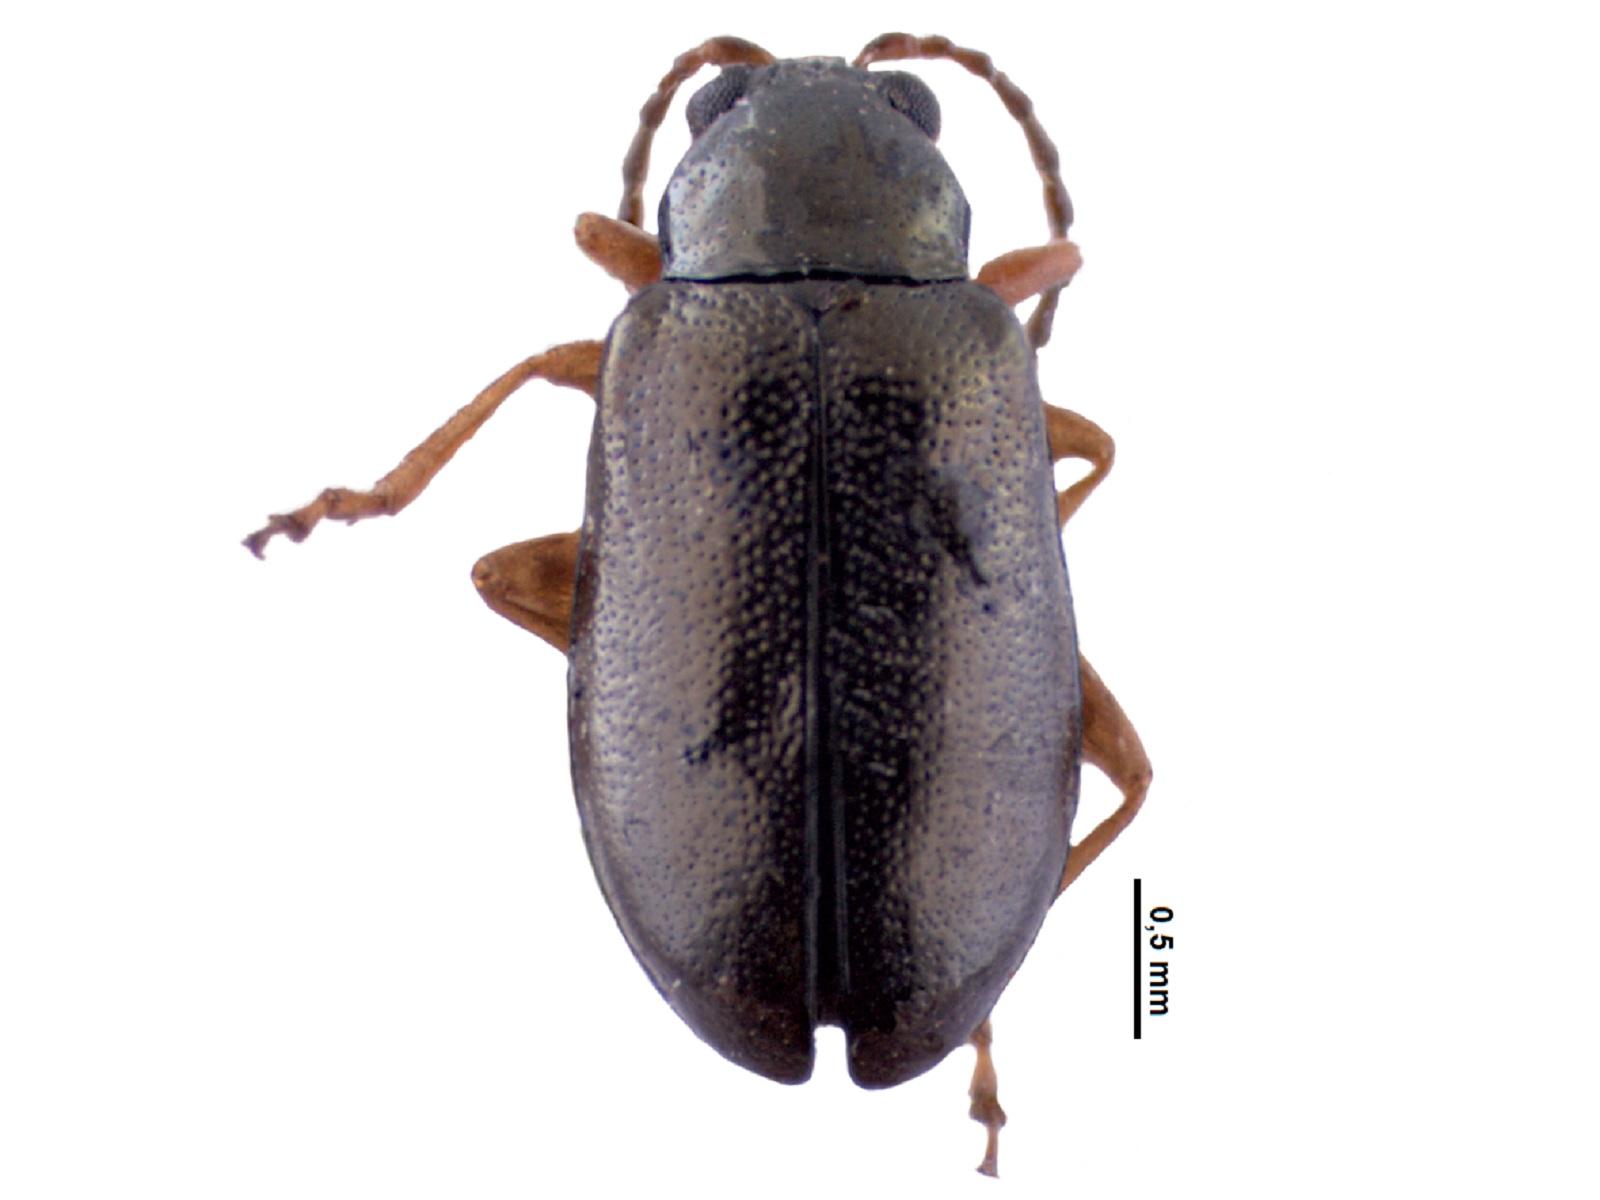 Lysathia integricollis (Harold, 1876)